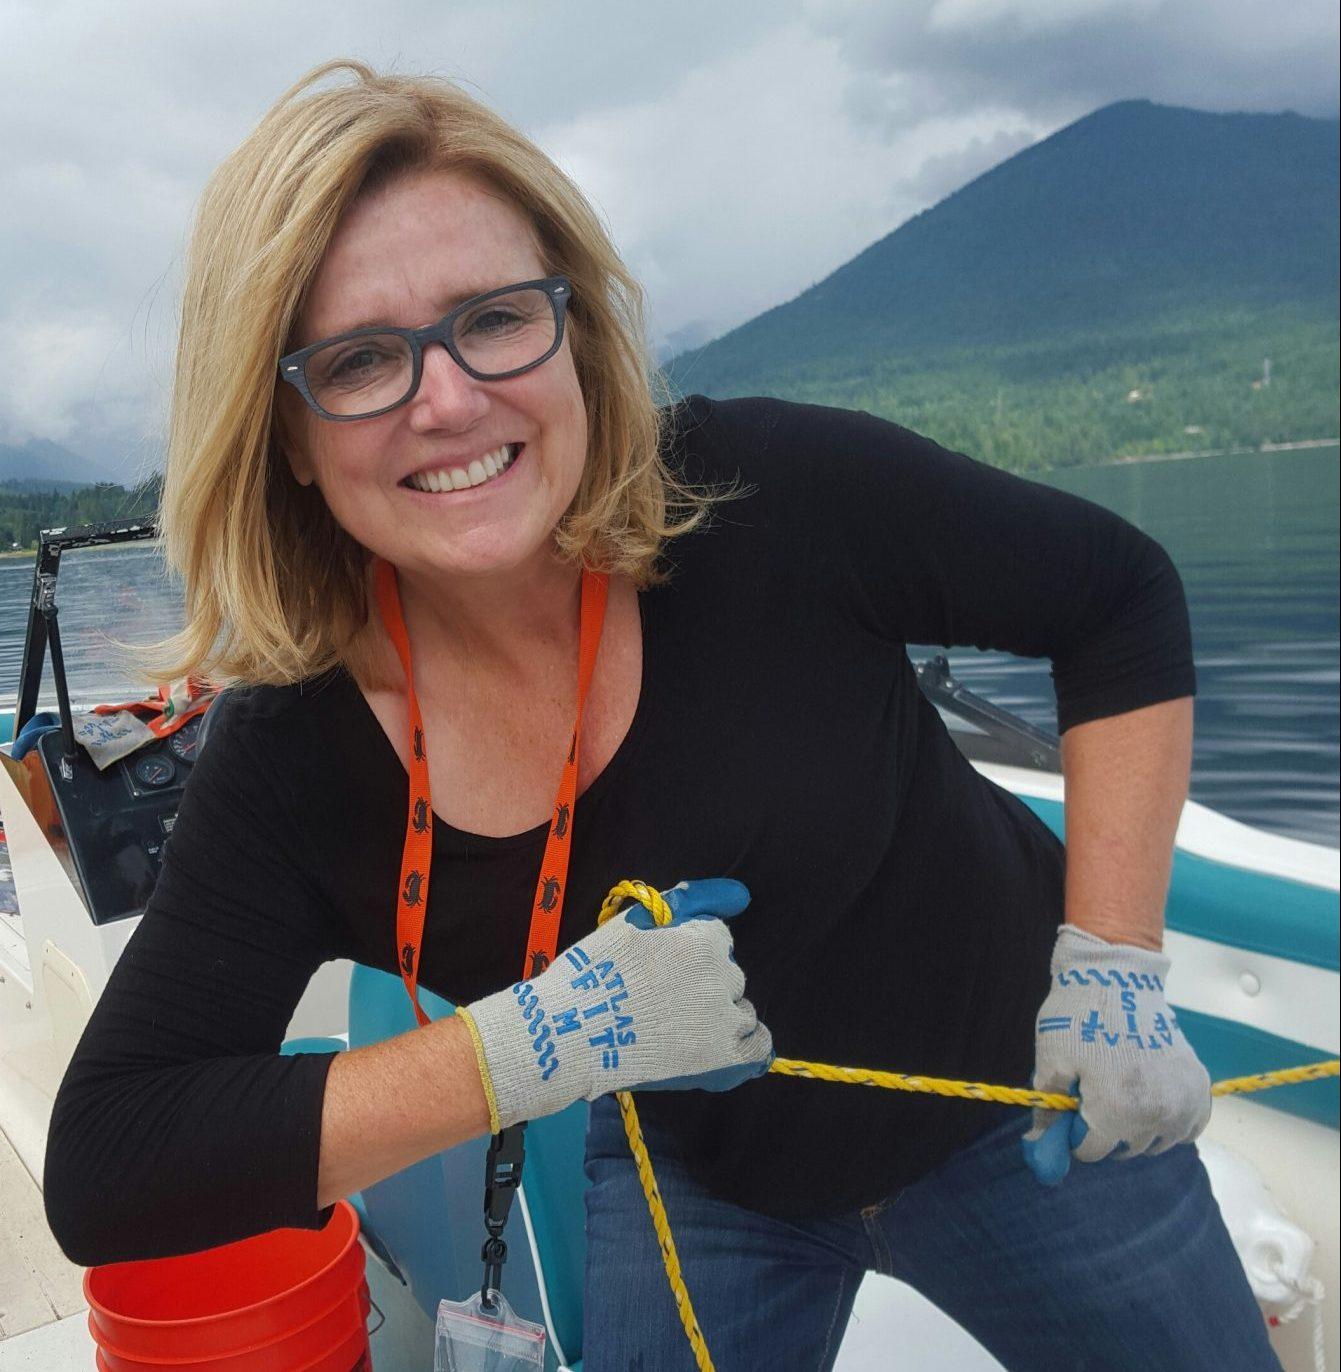 Marie K. Mentor, LLTK Board Vice President